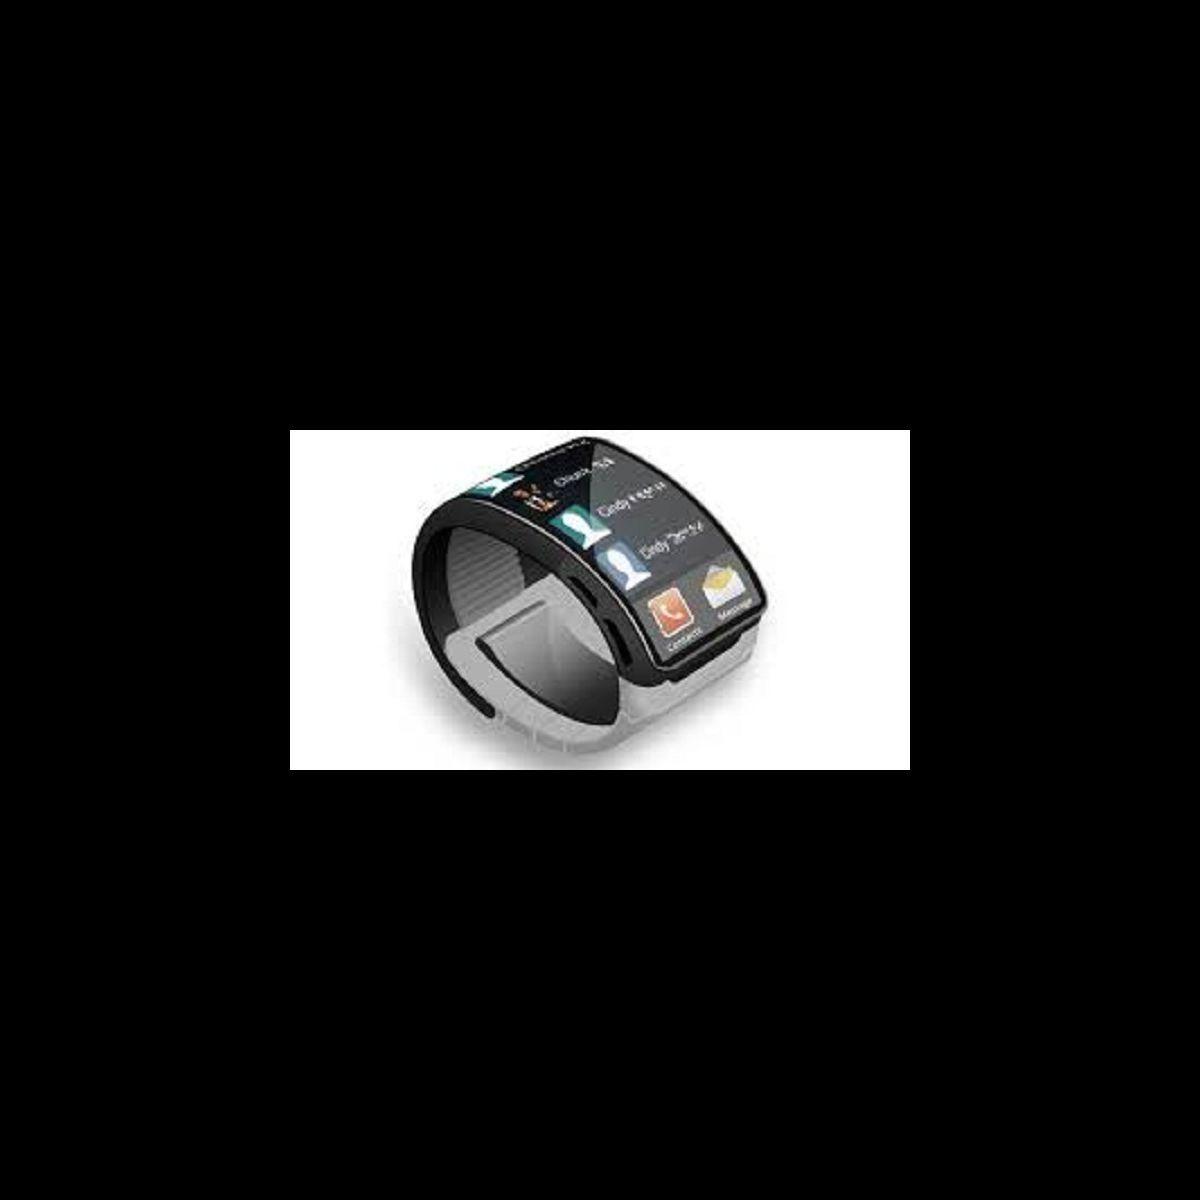 montres connect es samsung veut griller apple puremedias. Black Bedroom Furniture Sets. Home Design Ideas